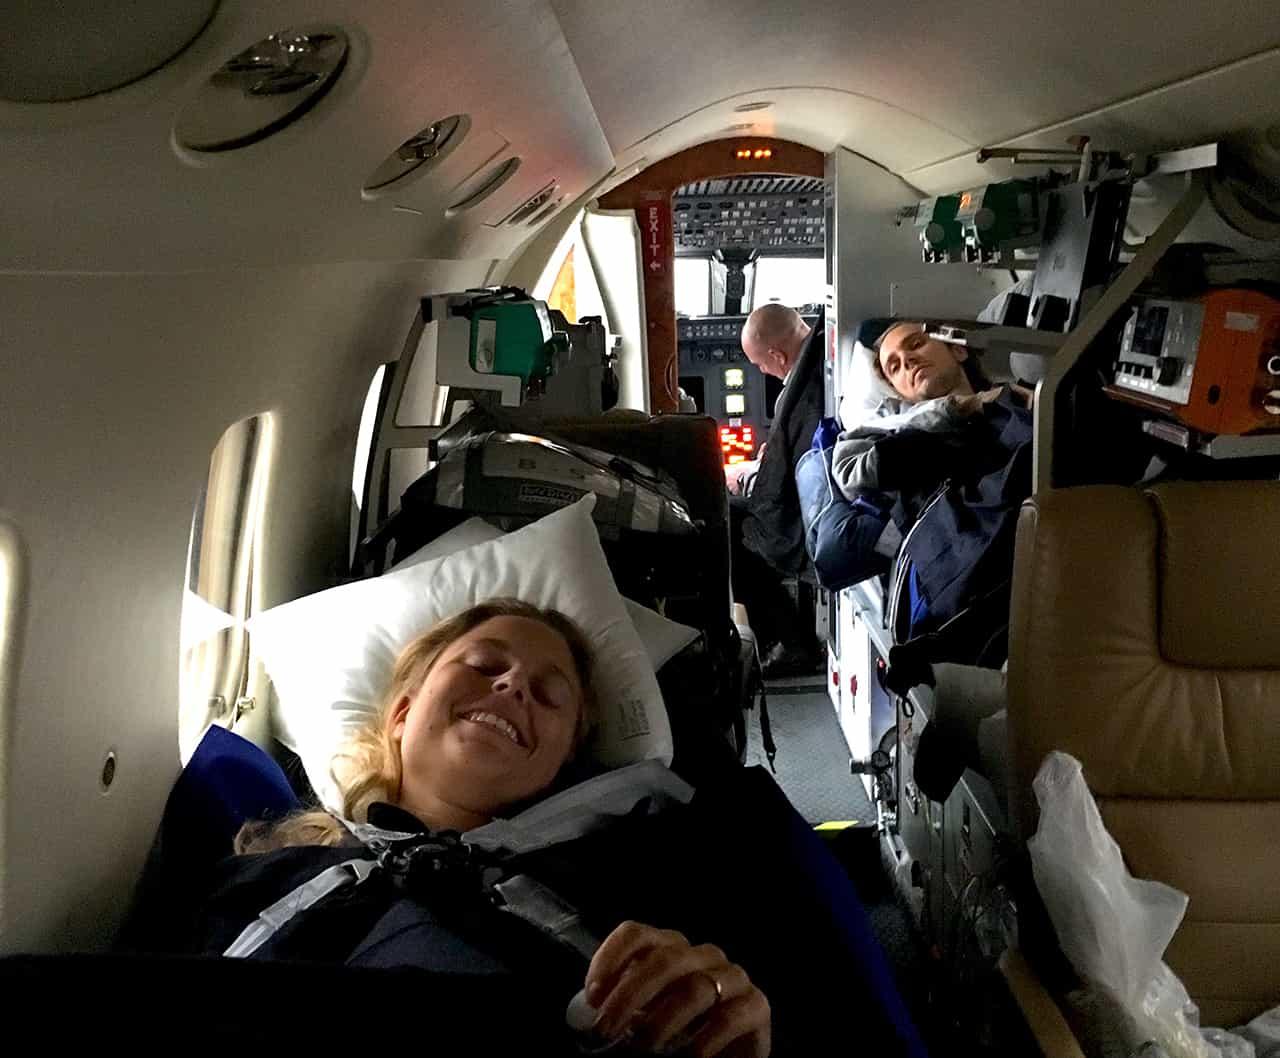 Ambulanzflugzeug Unfall unaufschiebbar